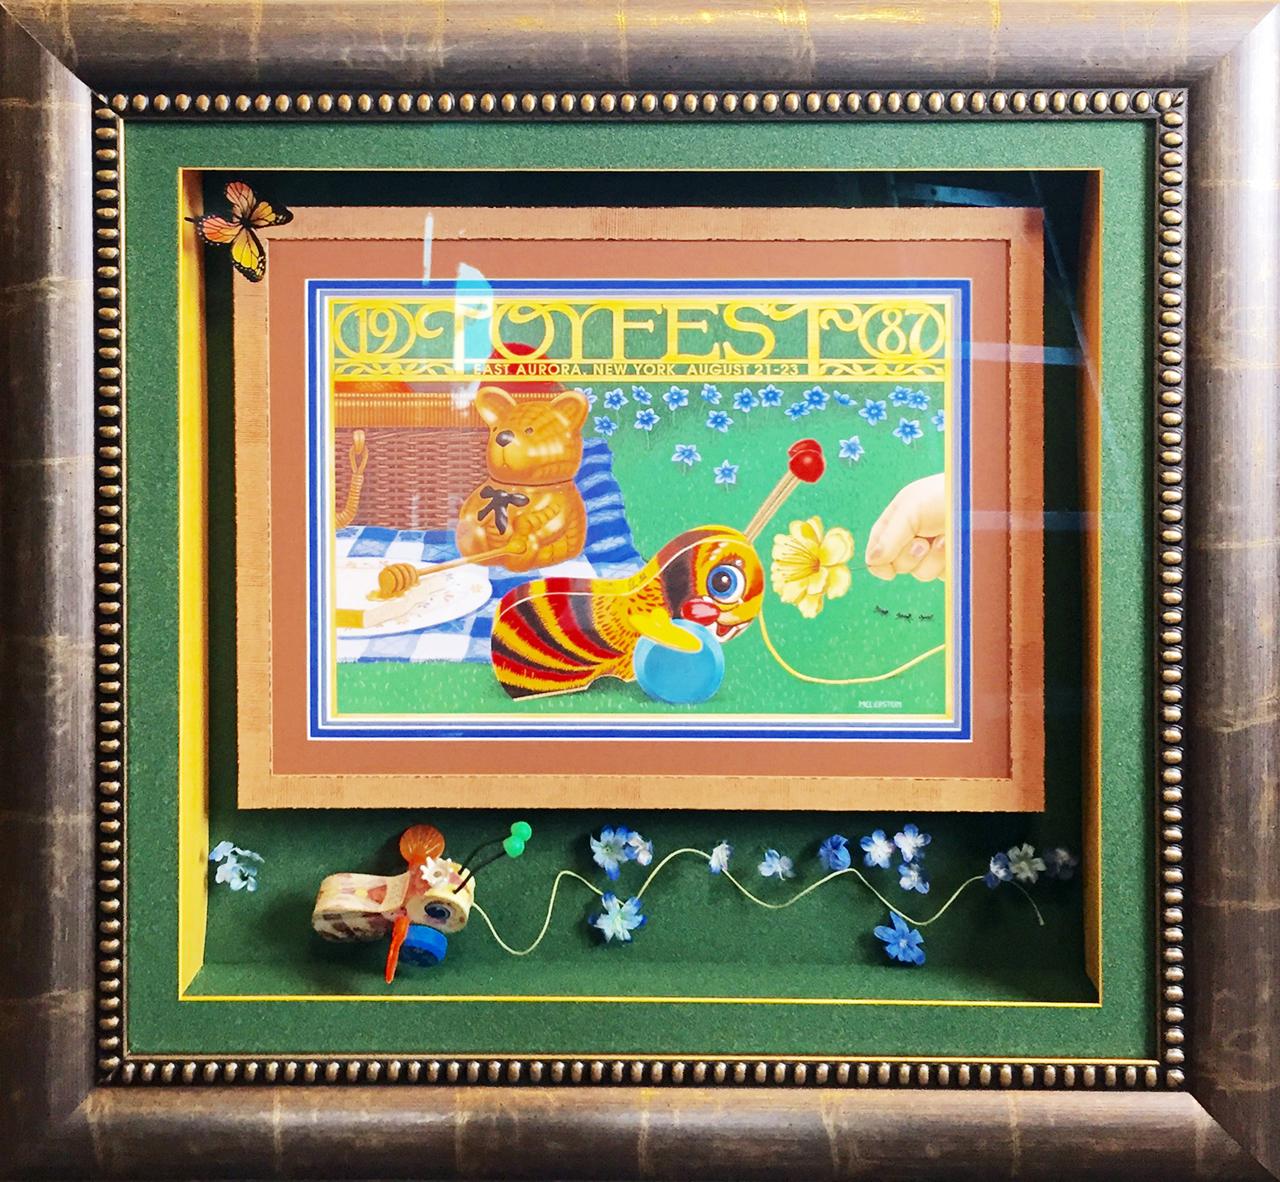 Grizzly creek framing award winning picture framing sports framing jerseys framing memorabilia framing 3d objects framing sports memorabilia jeuxipadfo Images